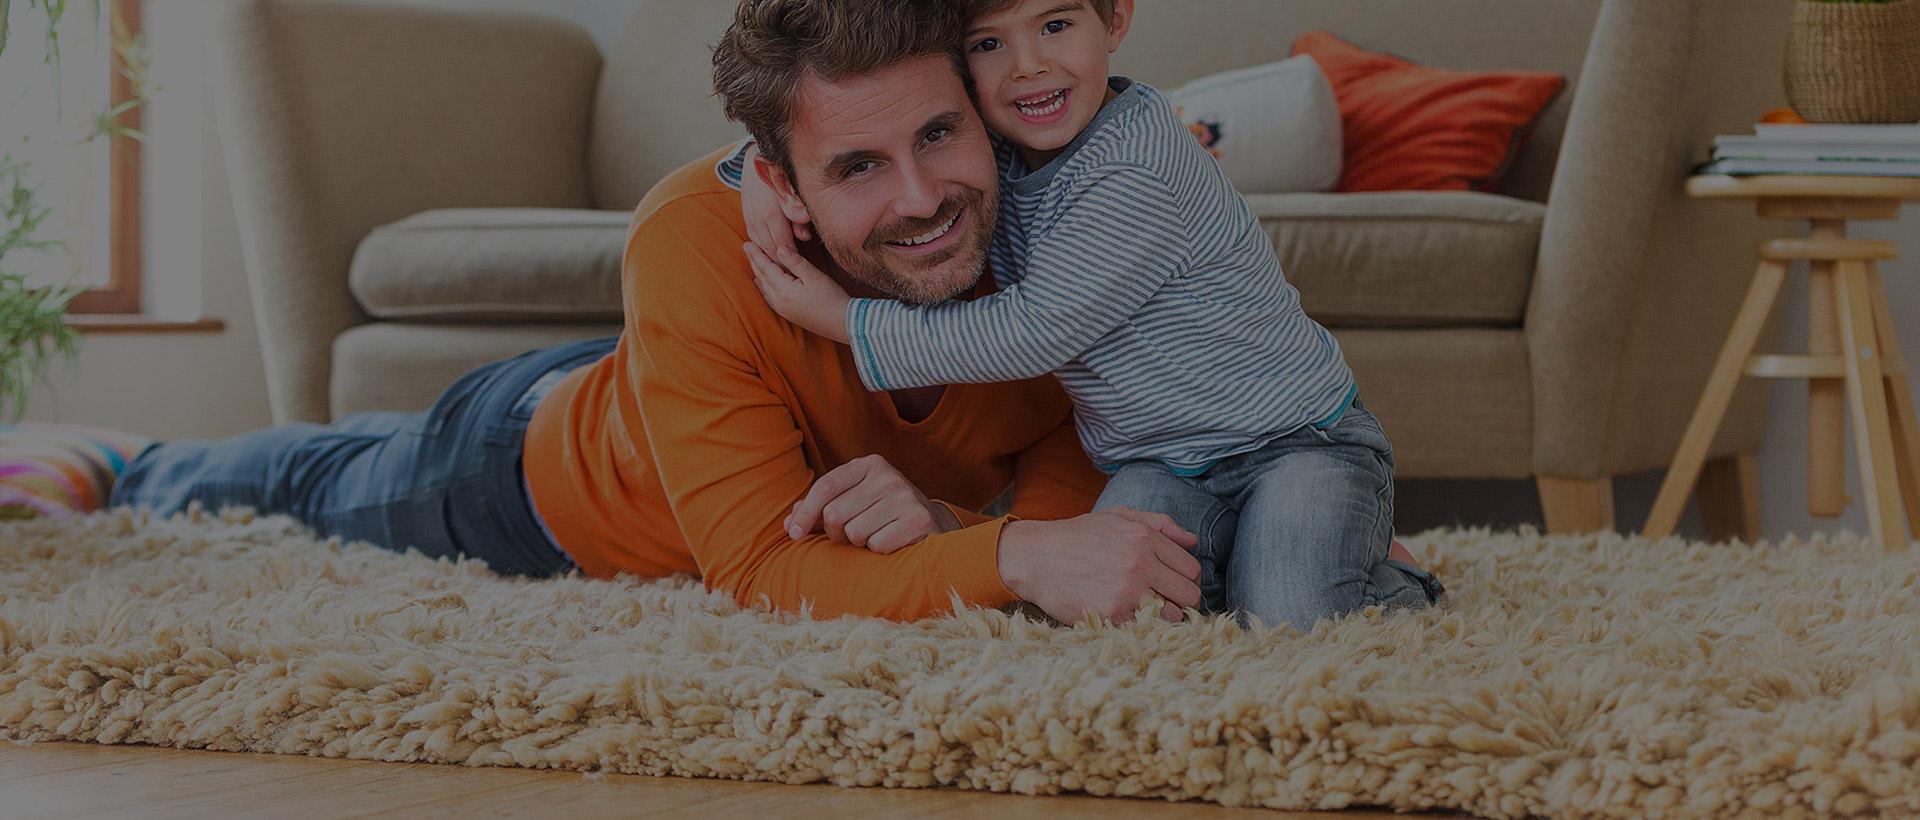 glasgow-carpet-cleaner